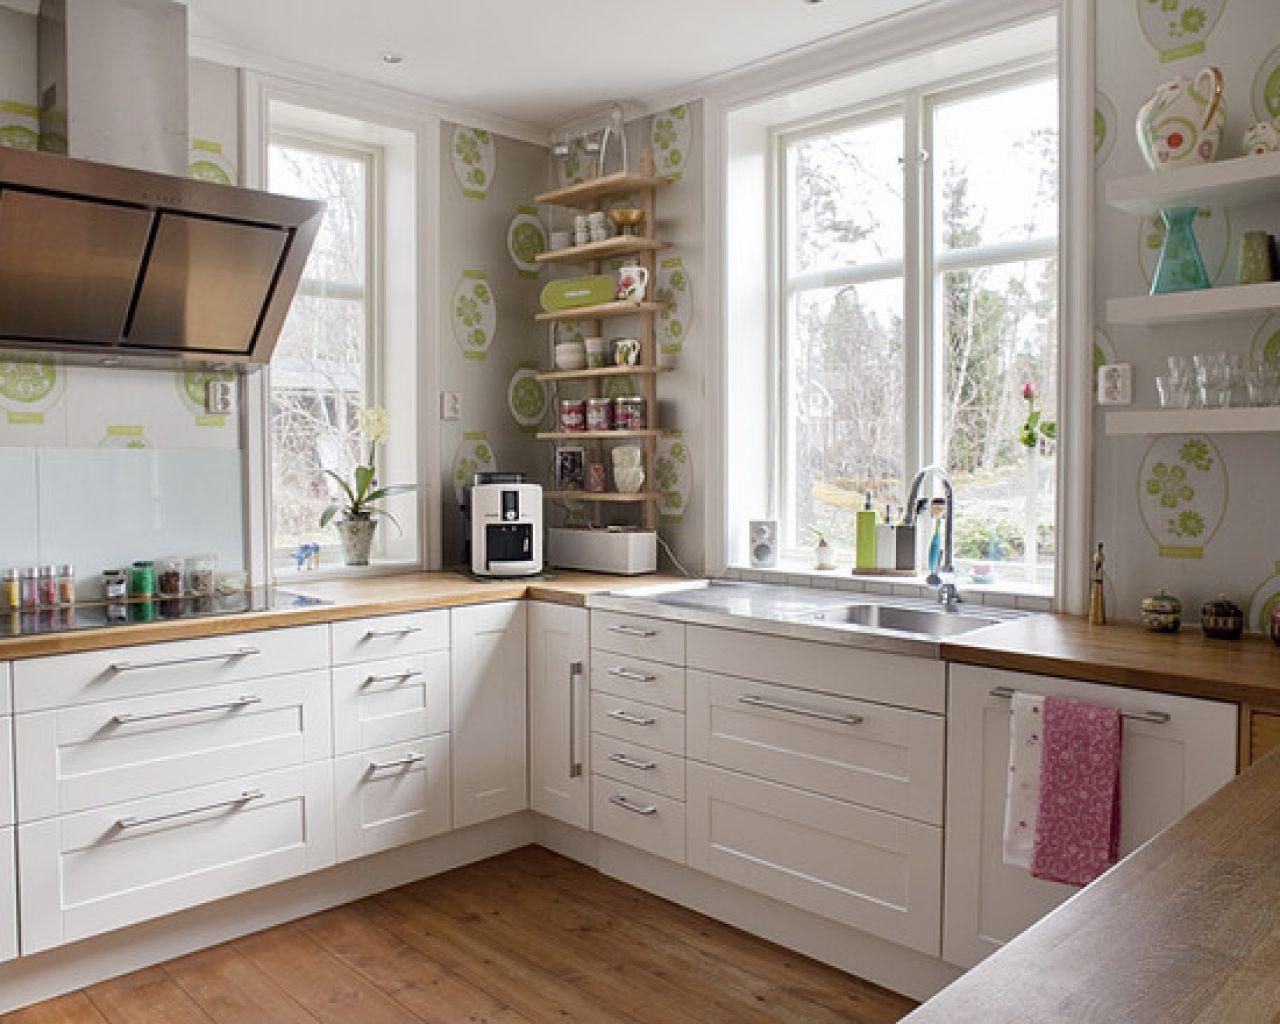 Ikea Kitchen Ideas | Ikea Kitchen Design Pictures Remodel Decor And Ideas